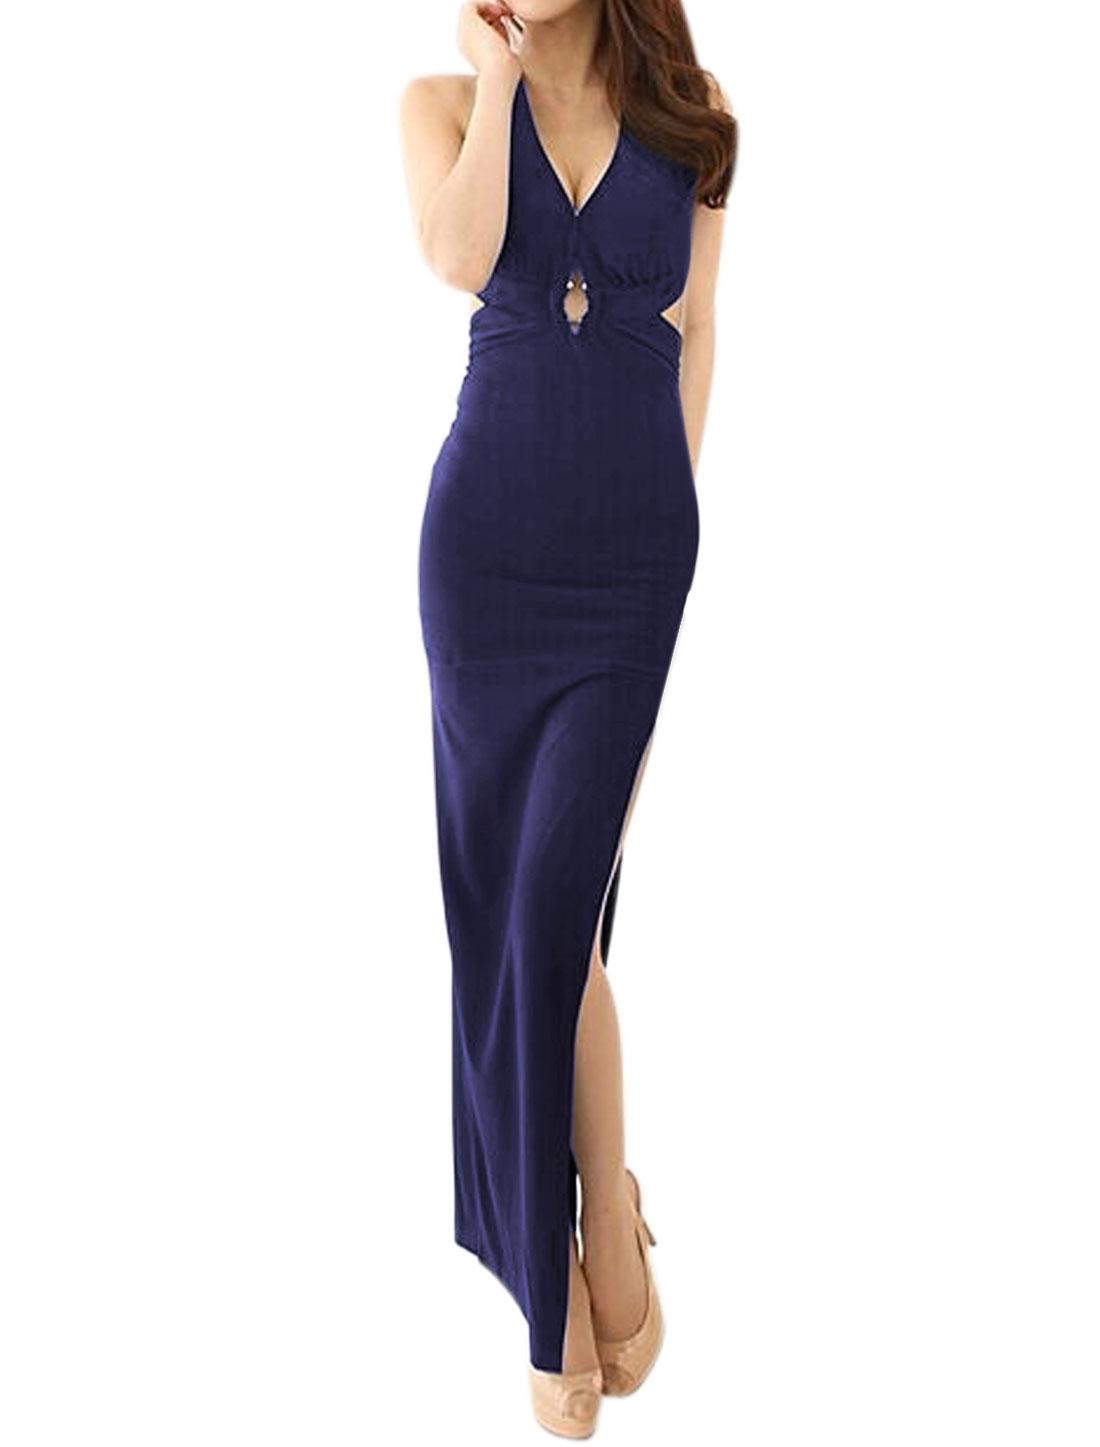 Lady Keyhole Front Halter Neck Backless High Split Maxi Dress Blue S